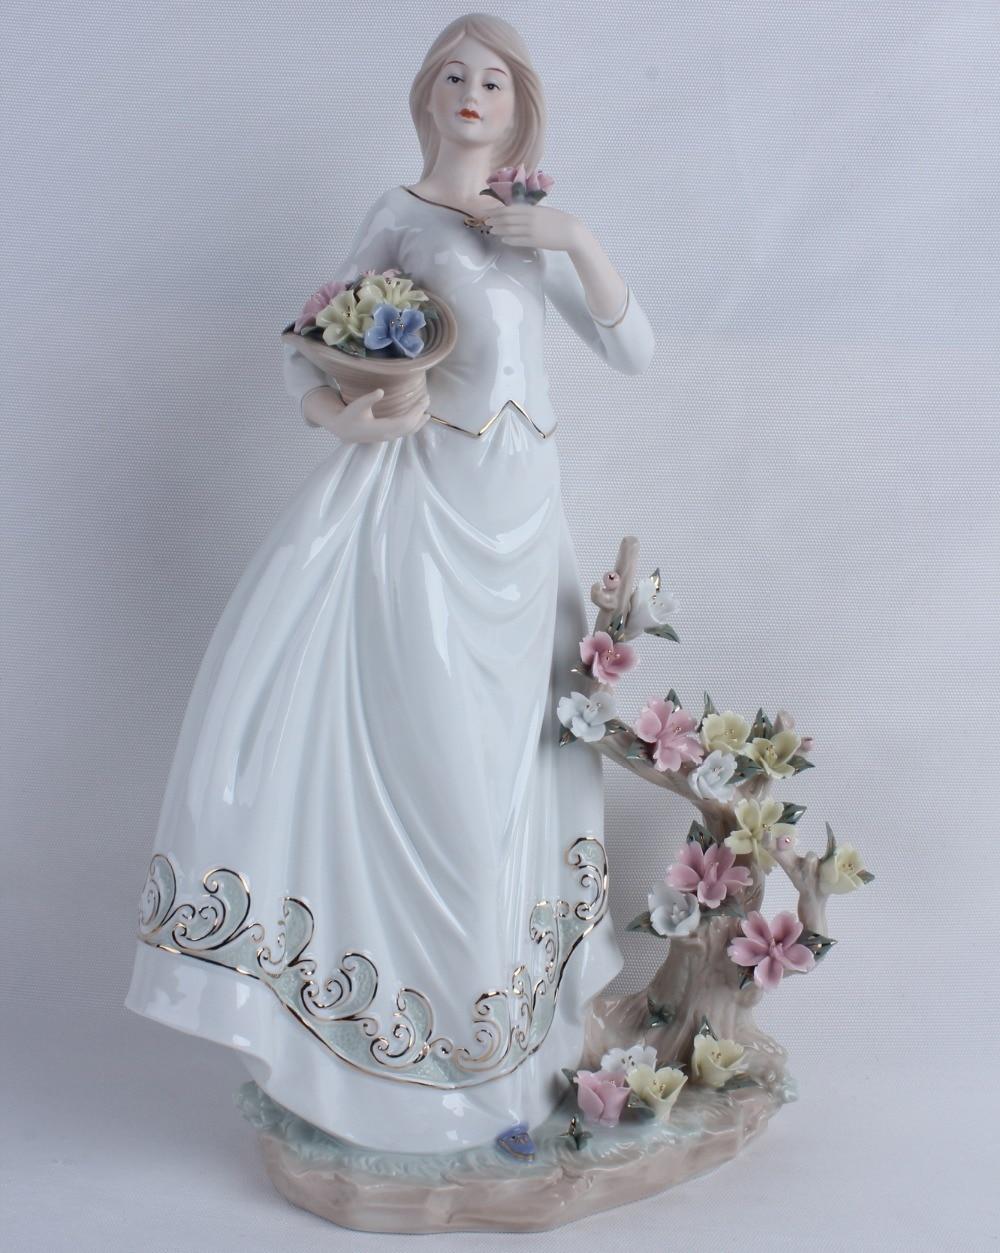 Vintage Porcelain Flower Picking Girl Miniature Statuette Handmade Ceramics Belle Figurine Decoration Craft Present Ornament